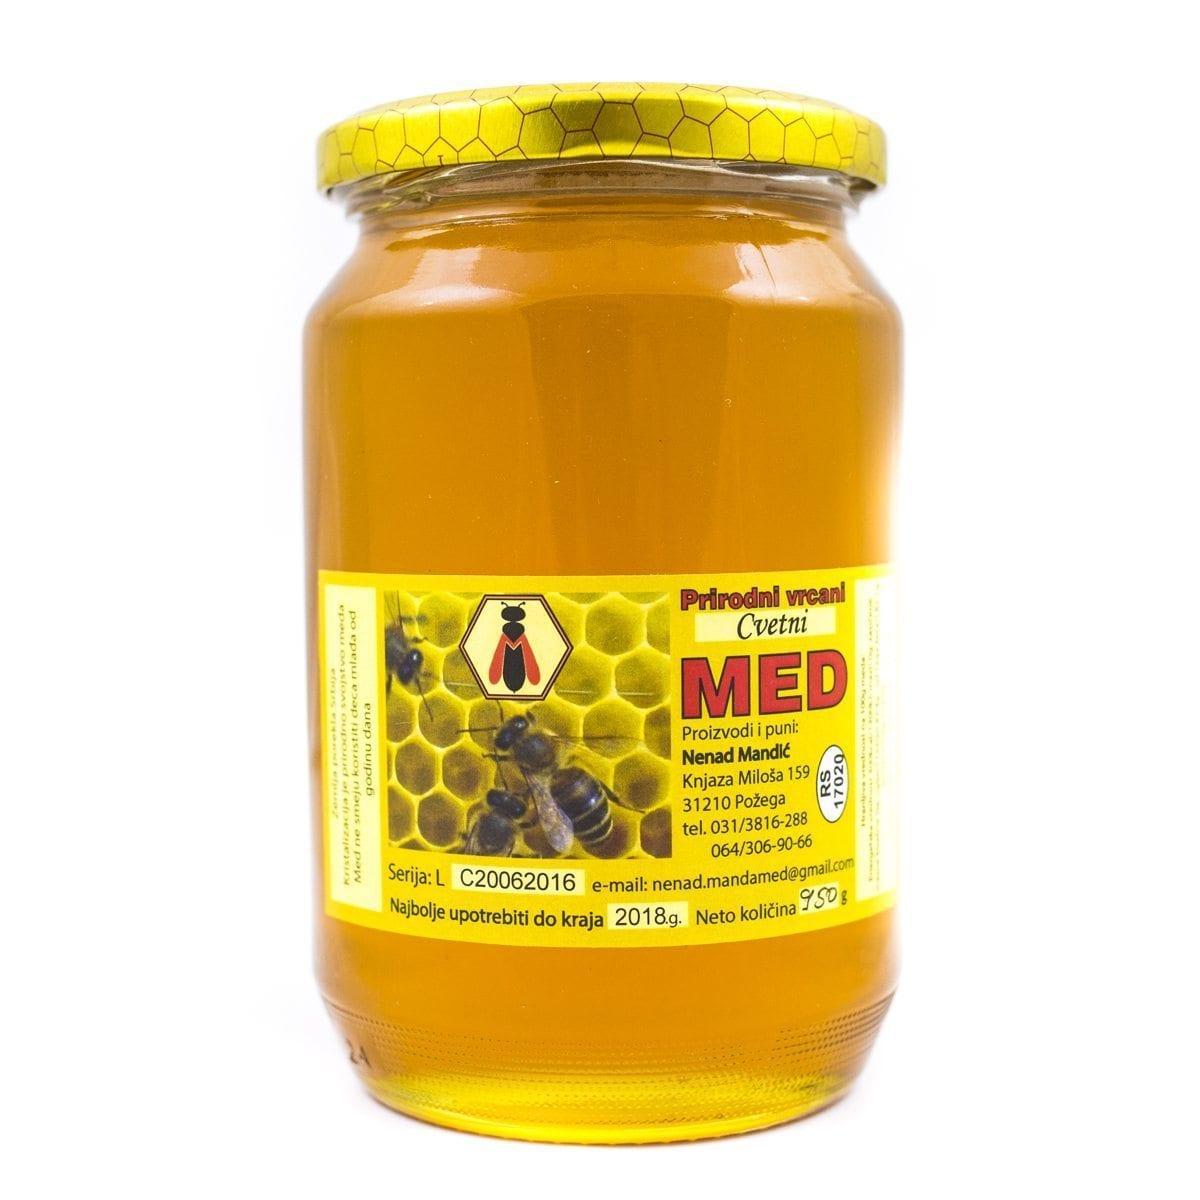 Med cvetni Mandić 950g